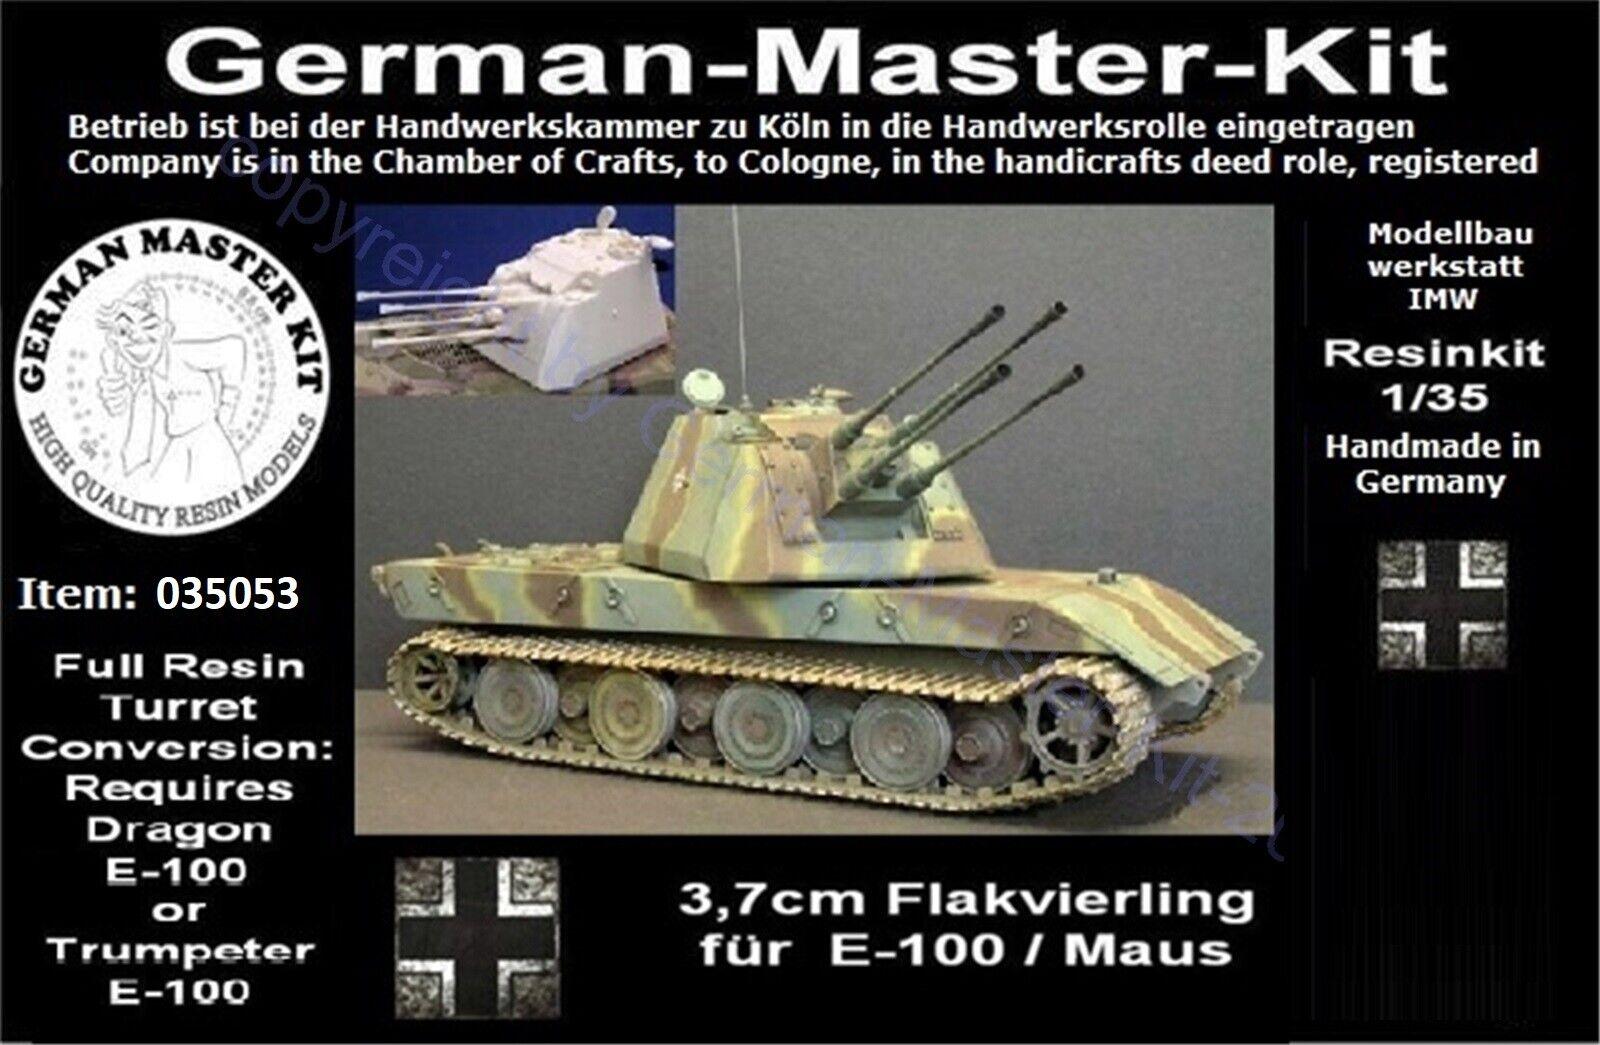 035053, Paper Panzer, 1 35, Conversions, 3,7cm Flakvierling w.Alu-Rohre, Resin